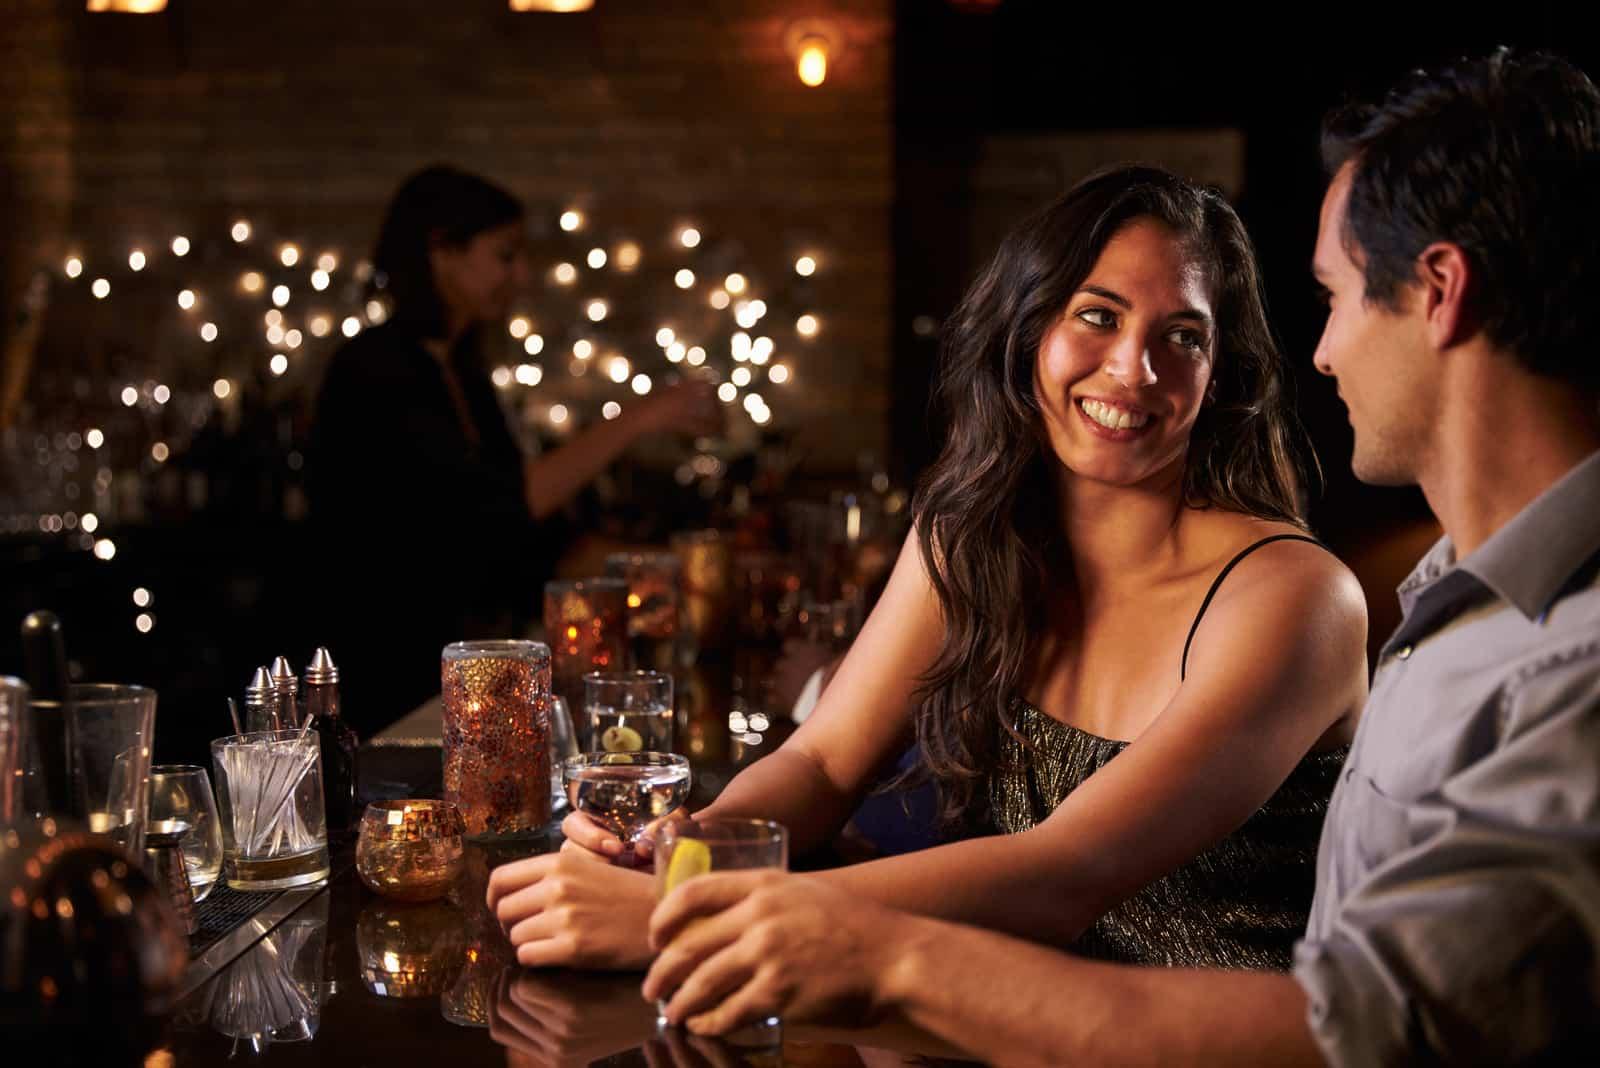 femme heureuse regardant un homme assis dans un bar